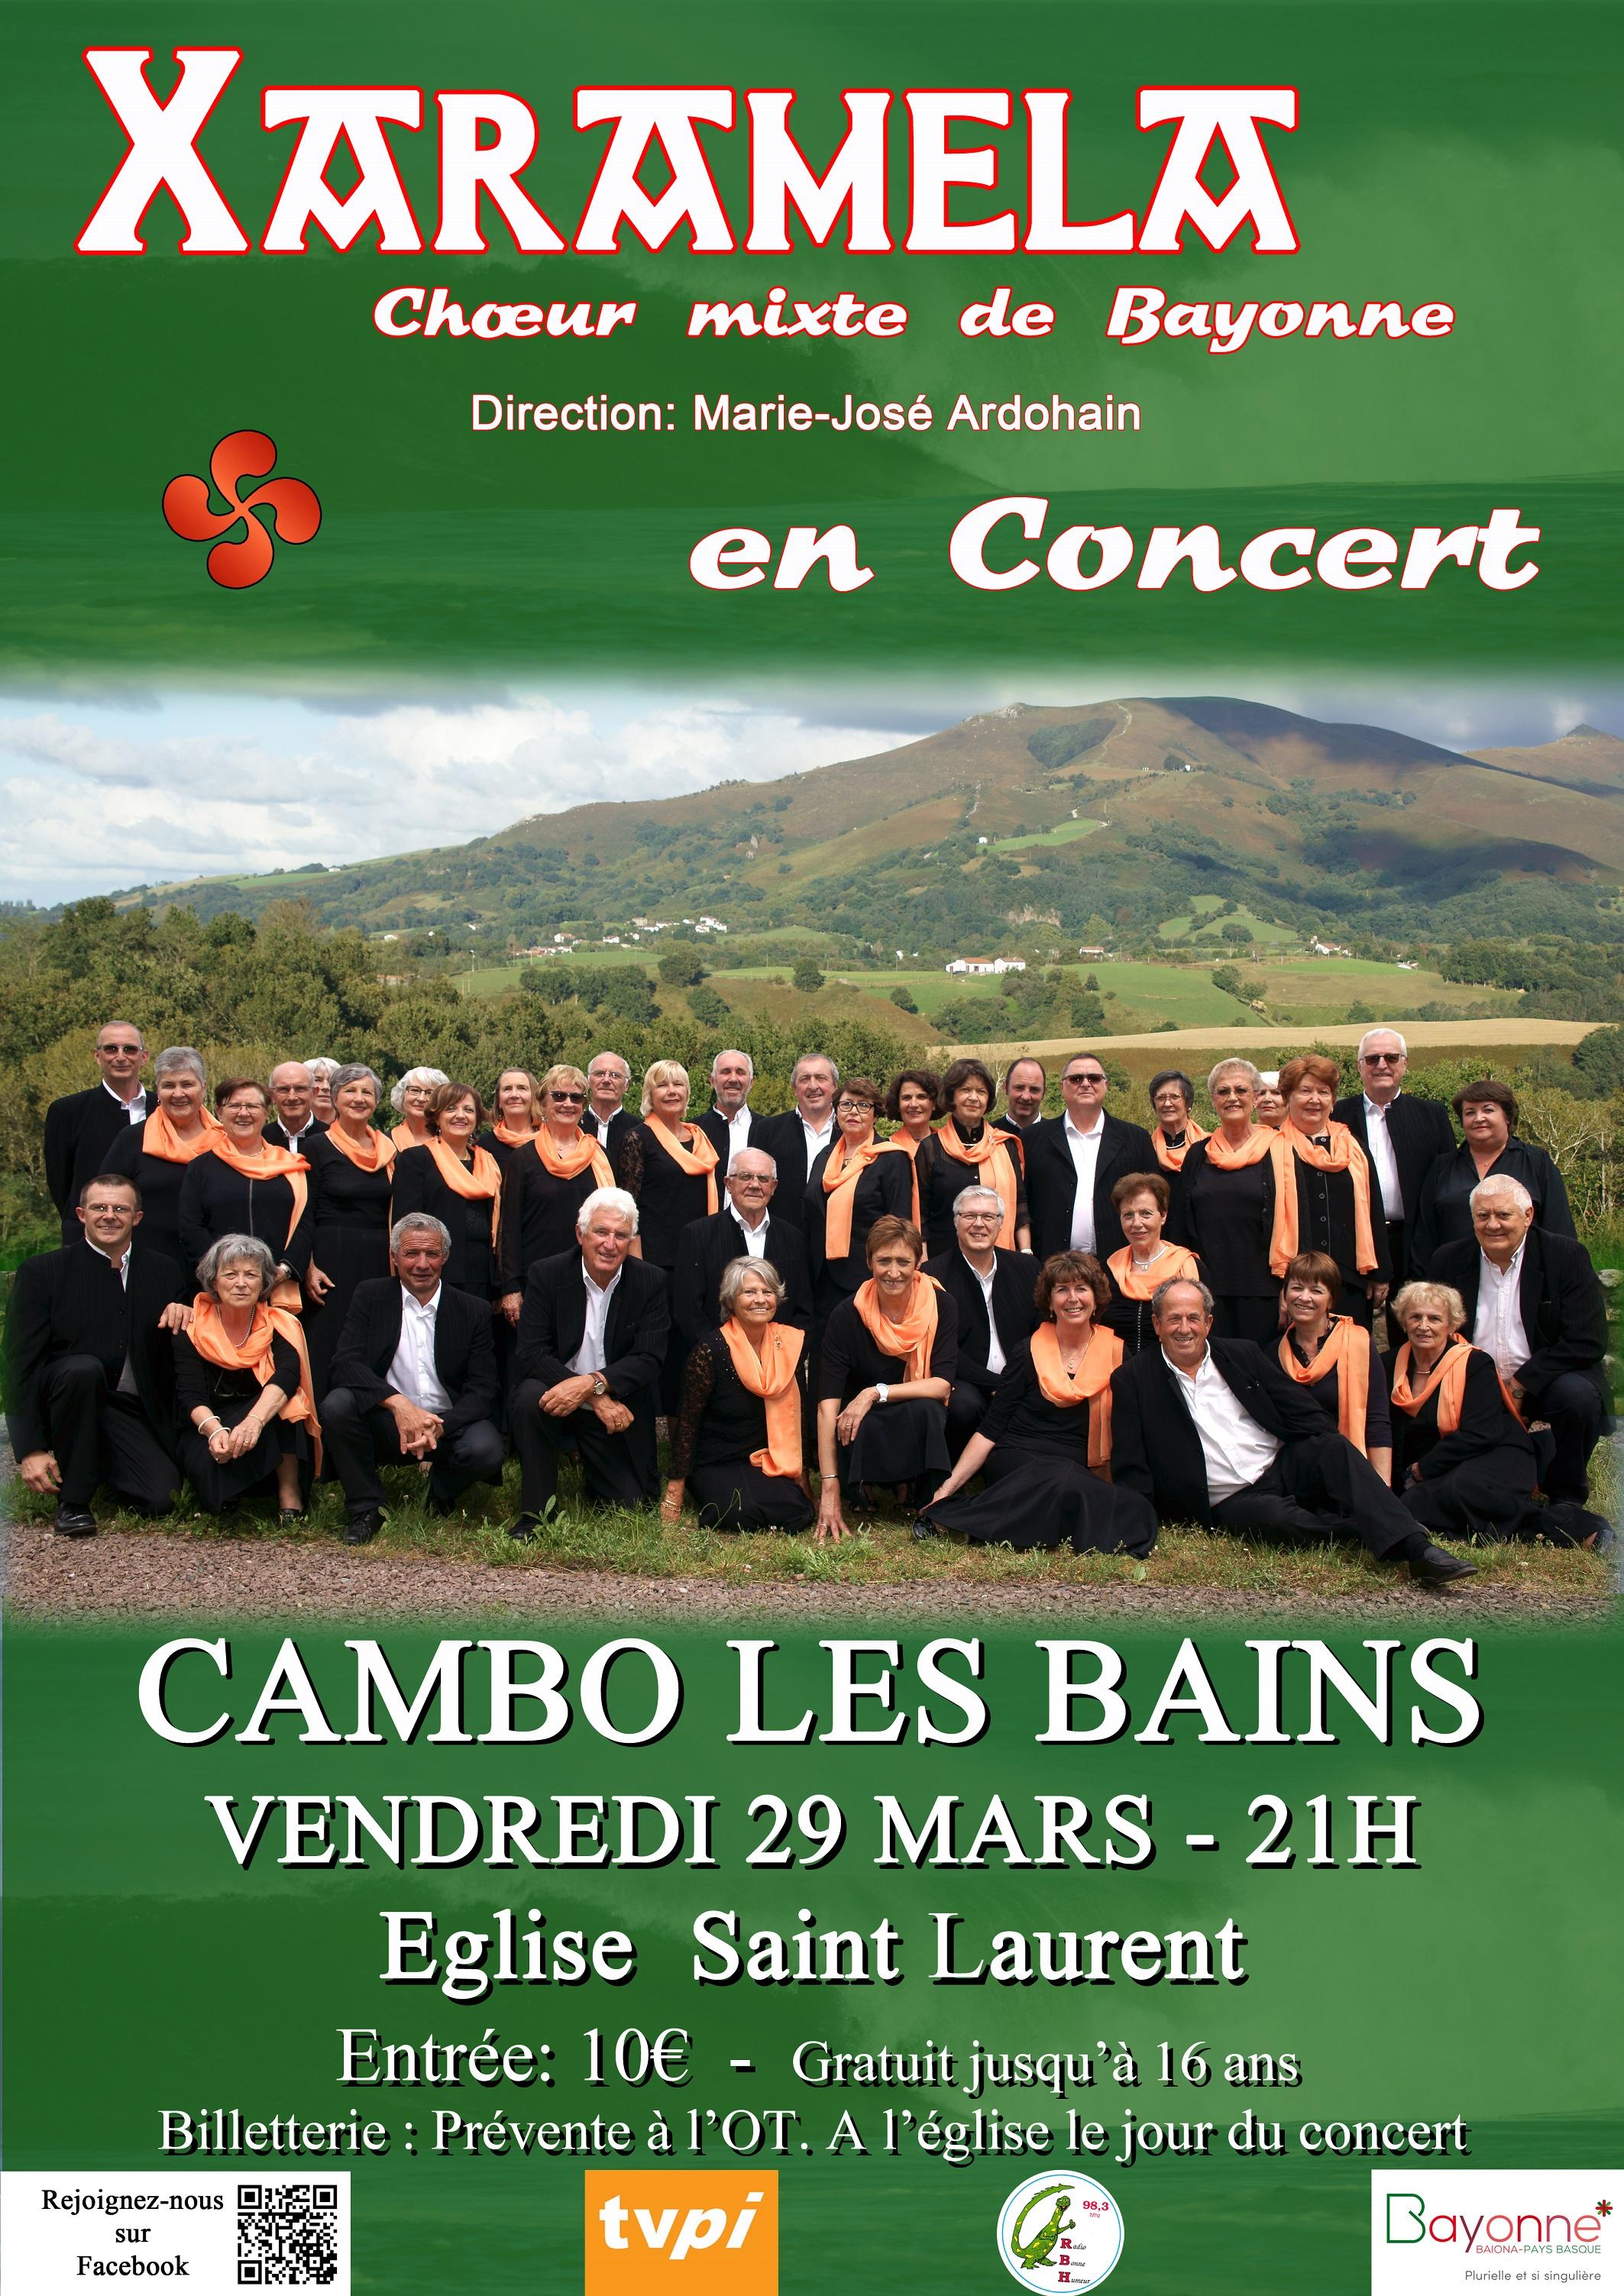 XARAMELA en concert à Cambo-les-Bains (64) le 29 mars 2019